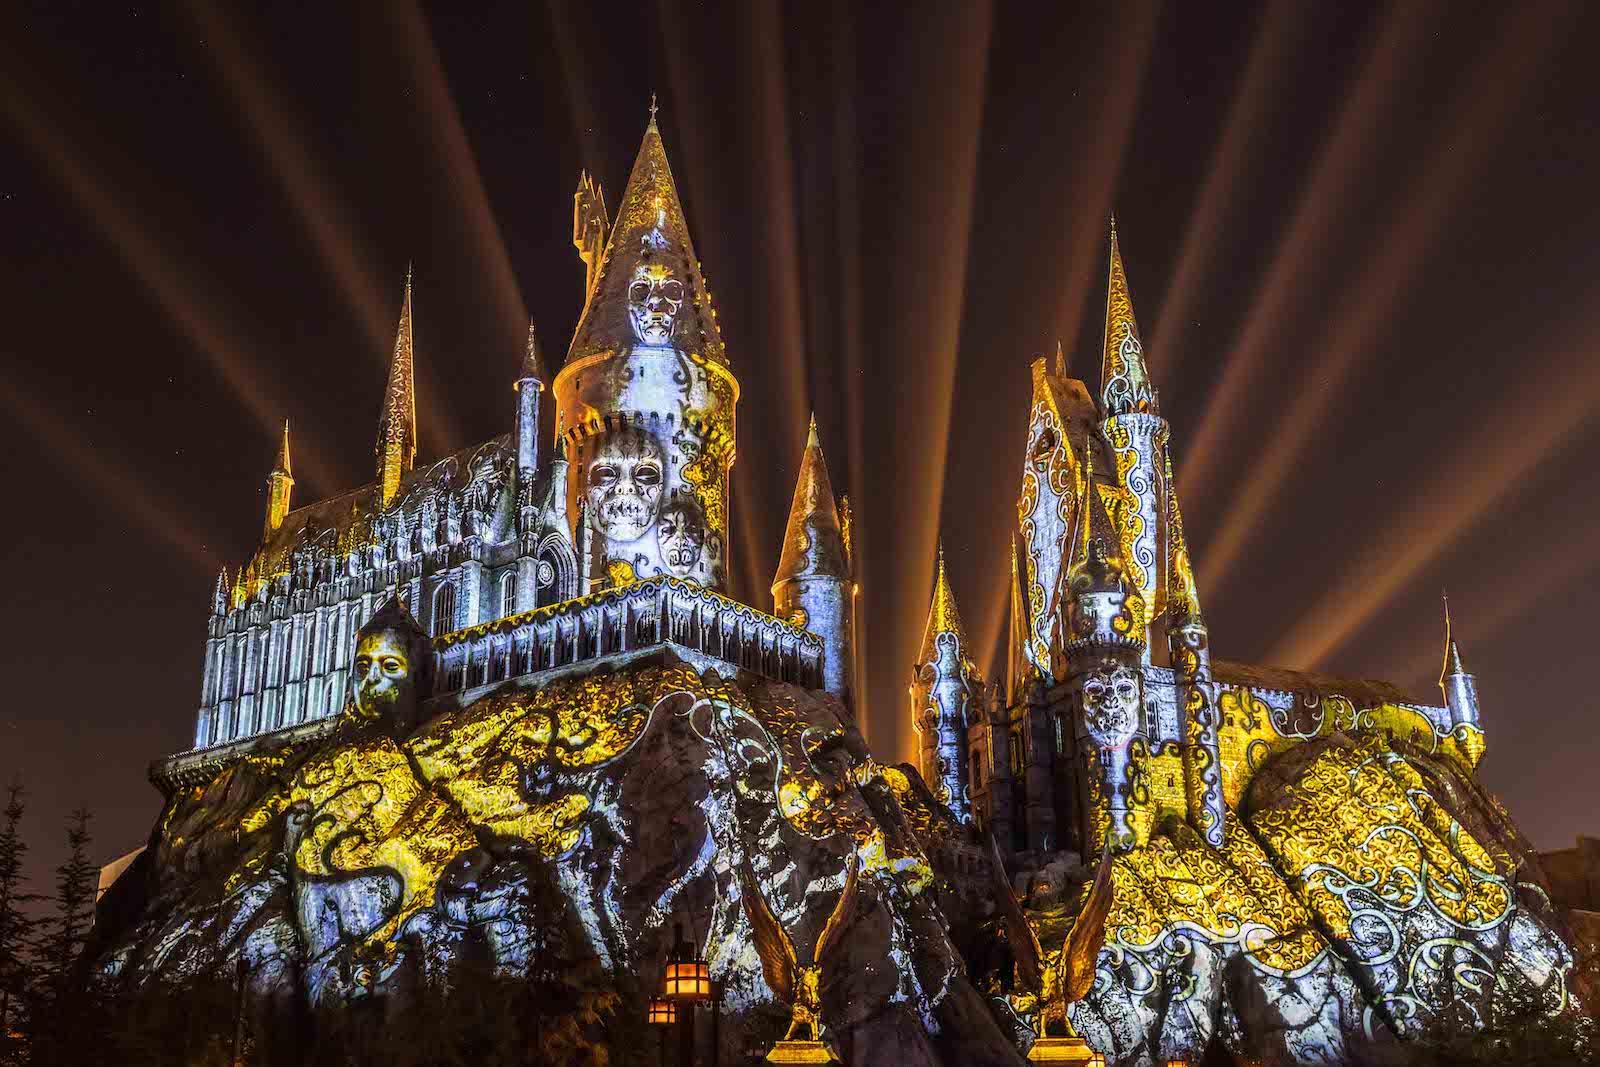 Universal Orlando   Dark Arts Hogwarts Castle projection ... on california orlando, windsor hills orlando, baldwin park orlando, sunland orlando, hollywood orlando,